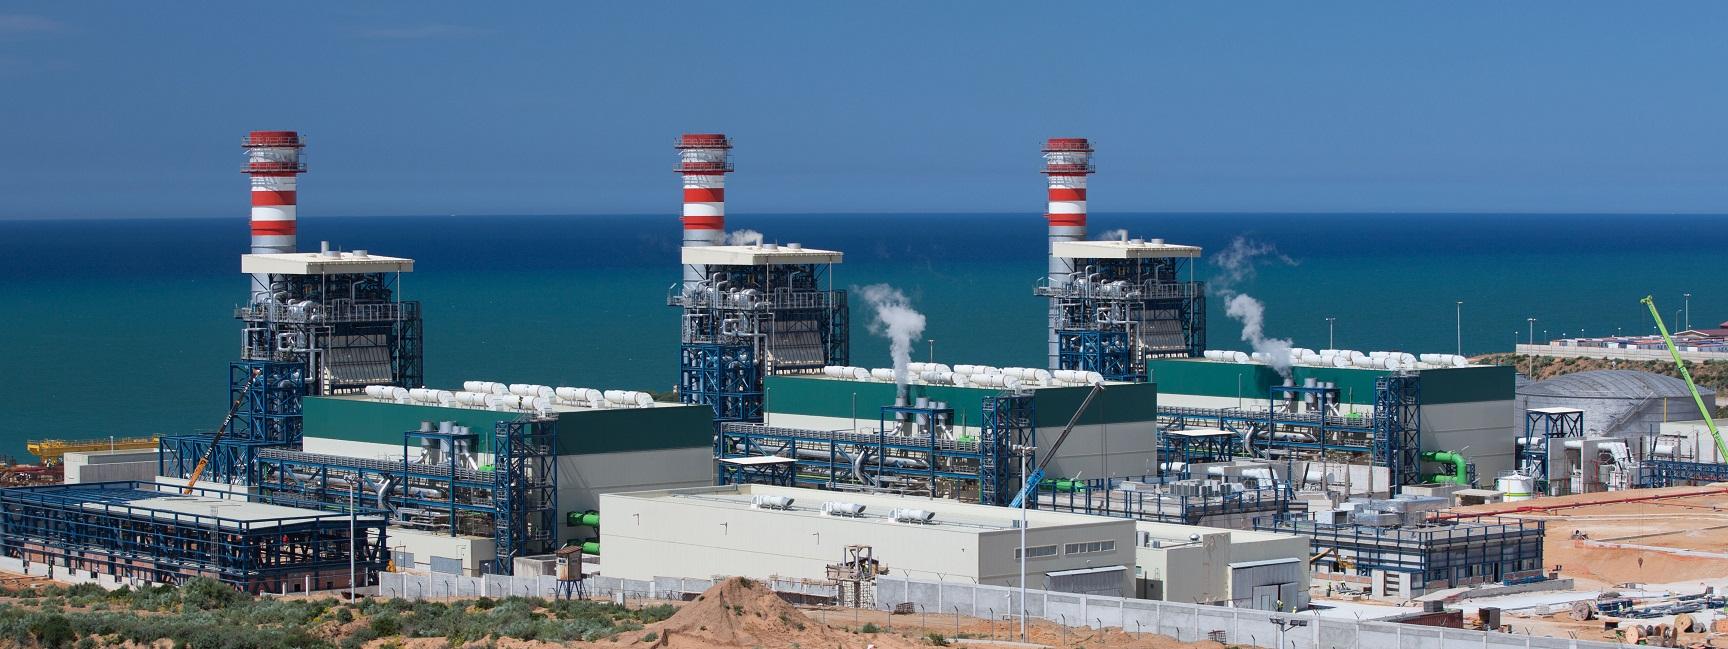 Sector energético en Argelia